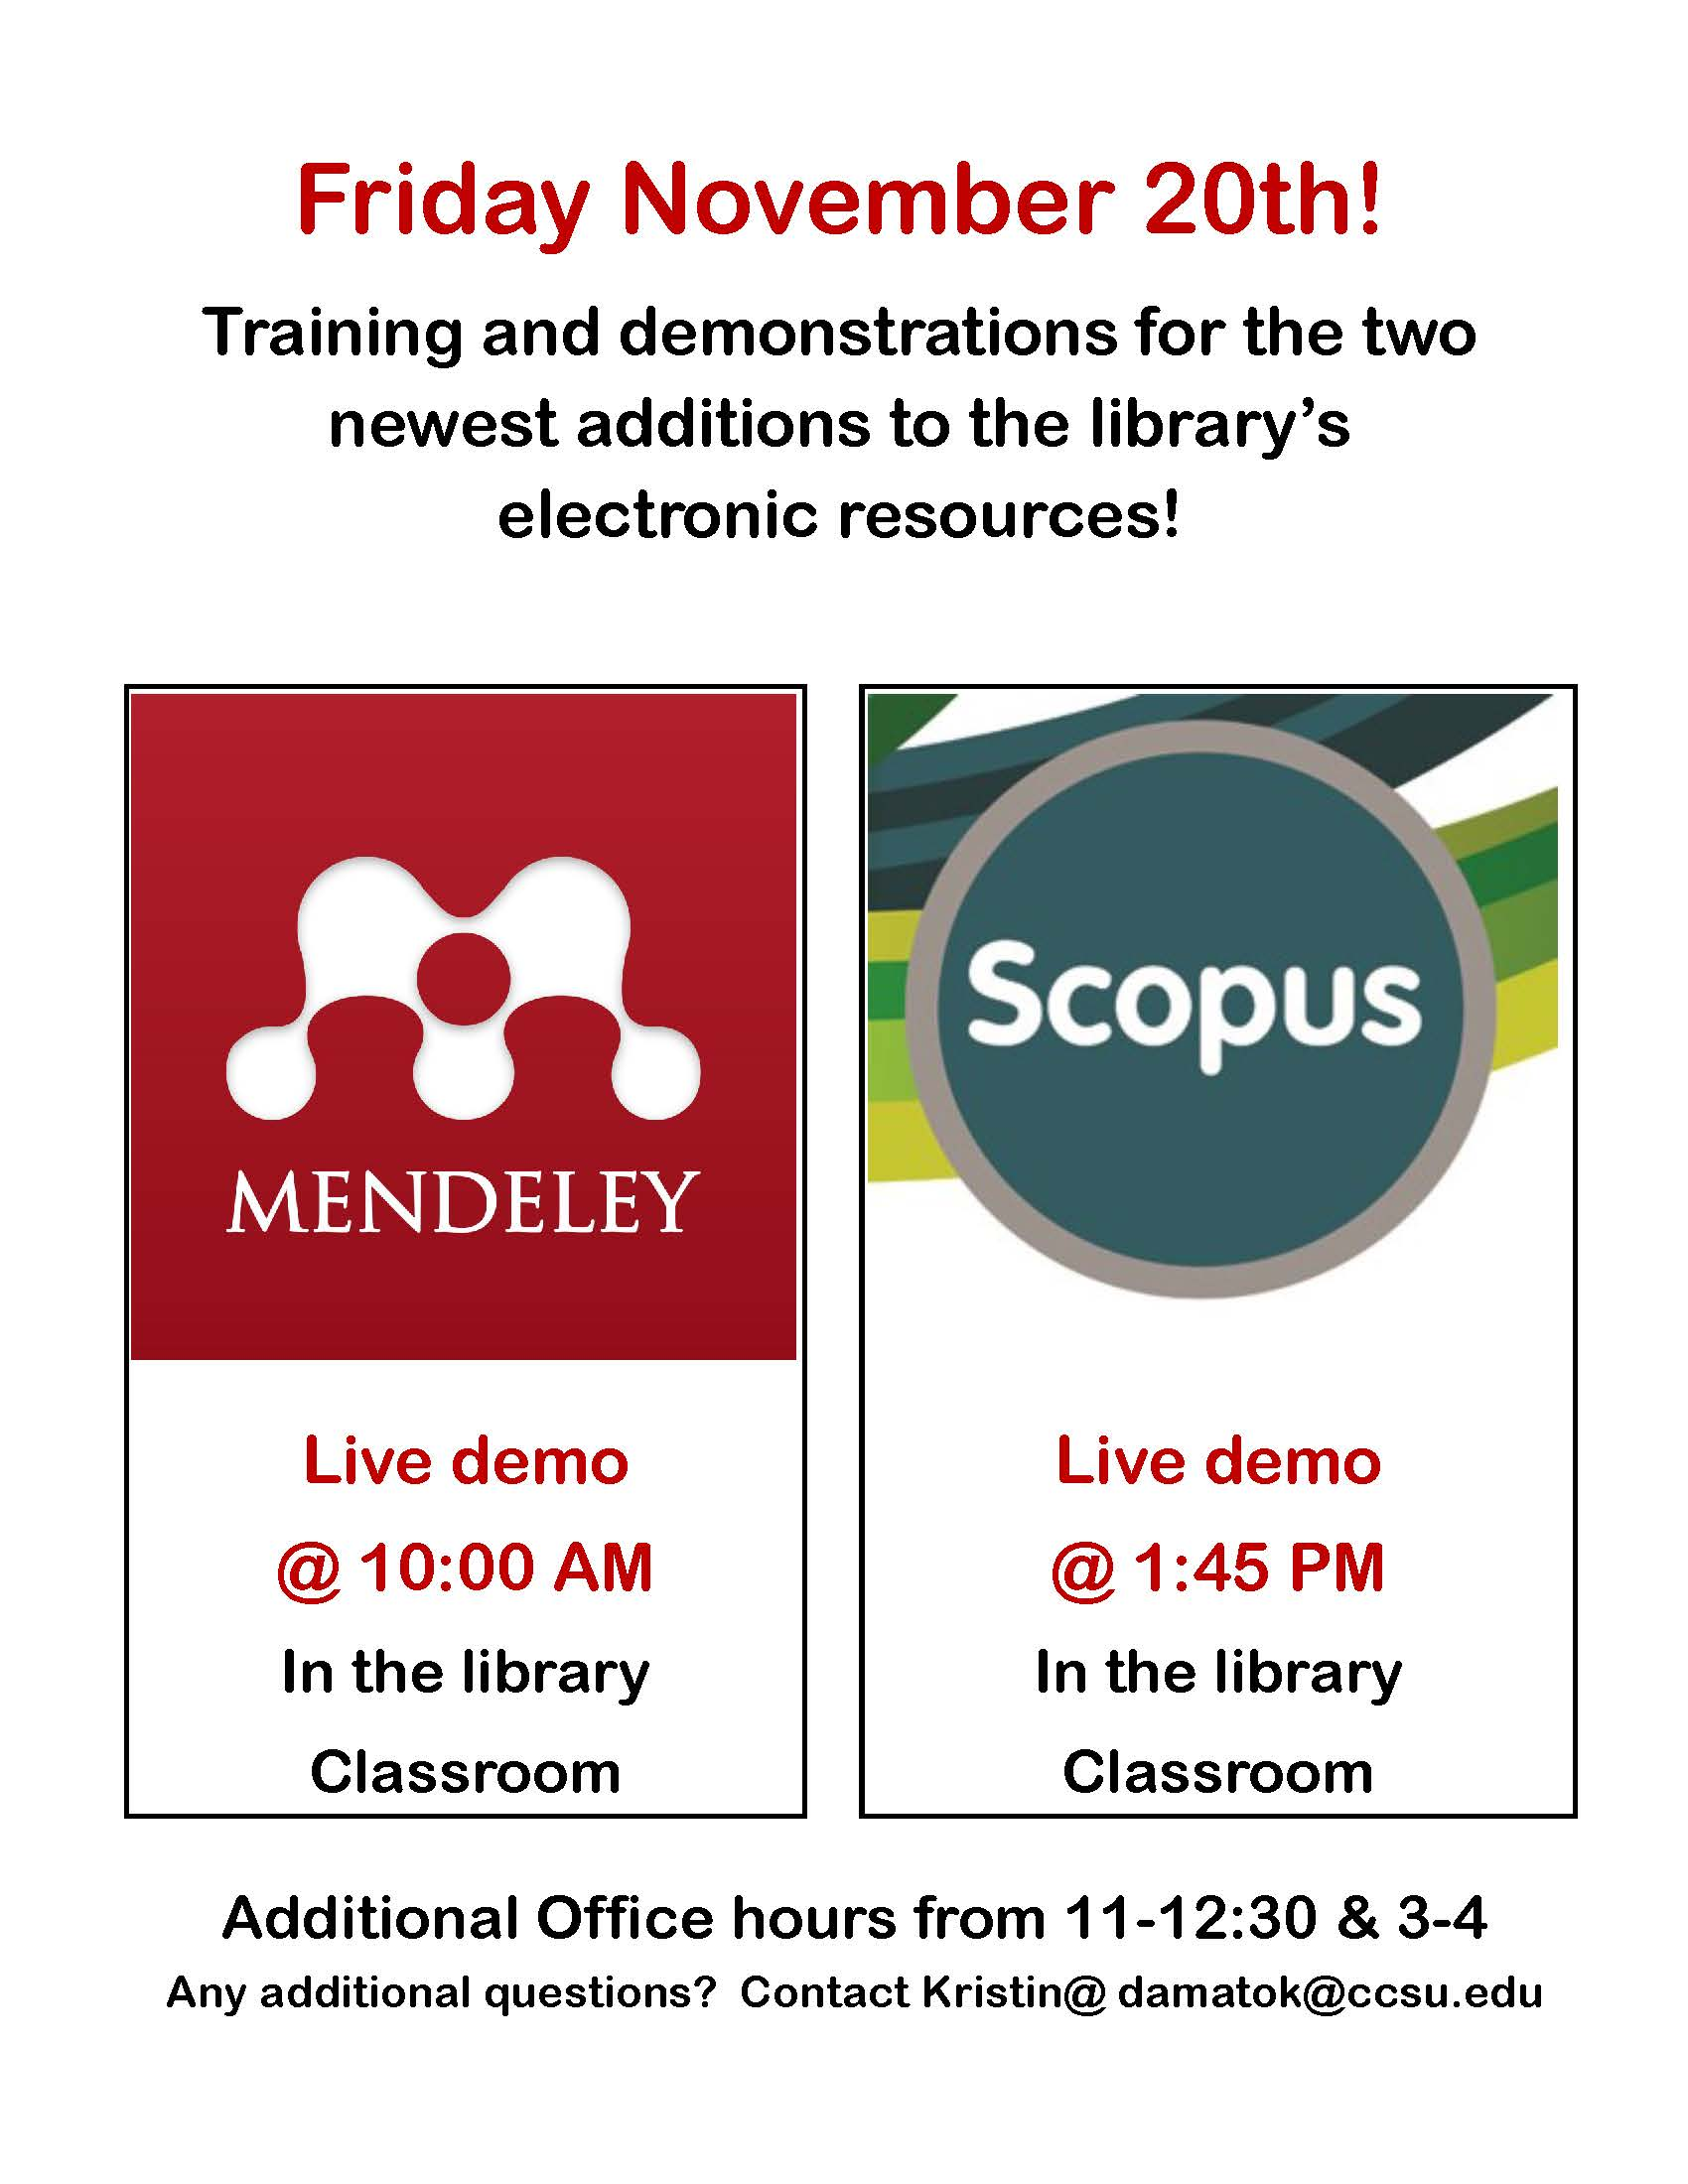 scopus_mendeley demo promo